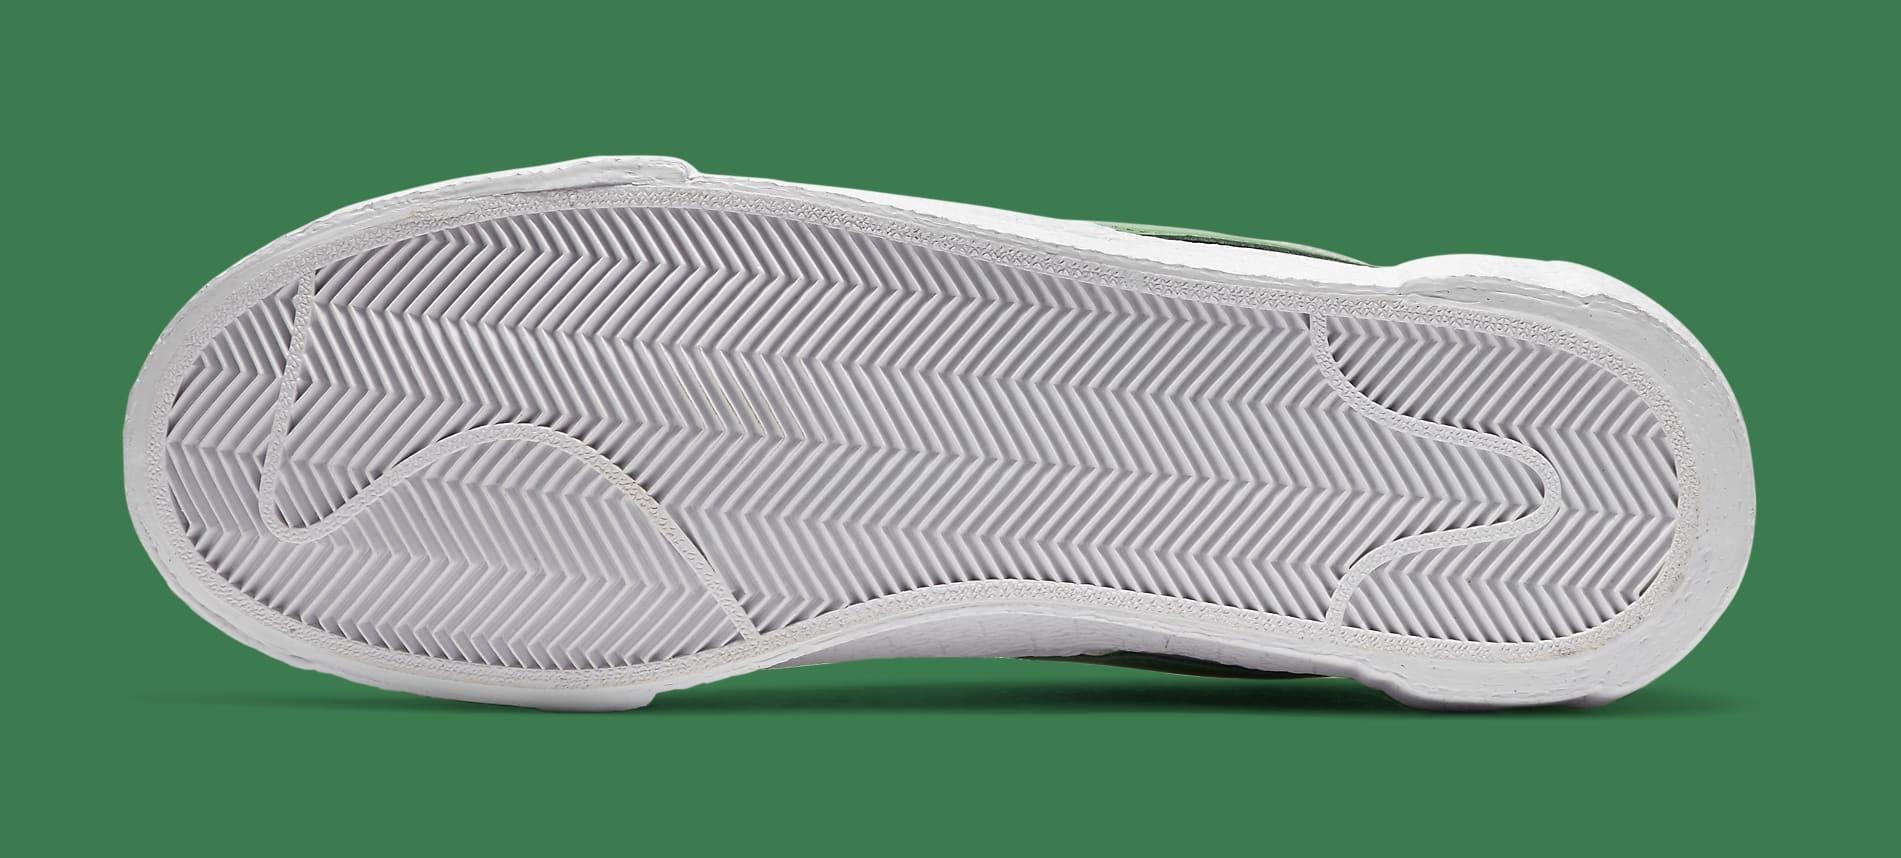 Sacai x Nike Blazer Low 'Classic Green' DD1877-001 Outsole